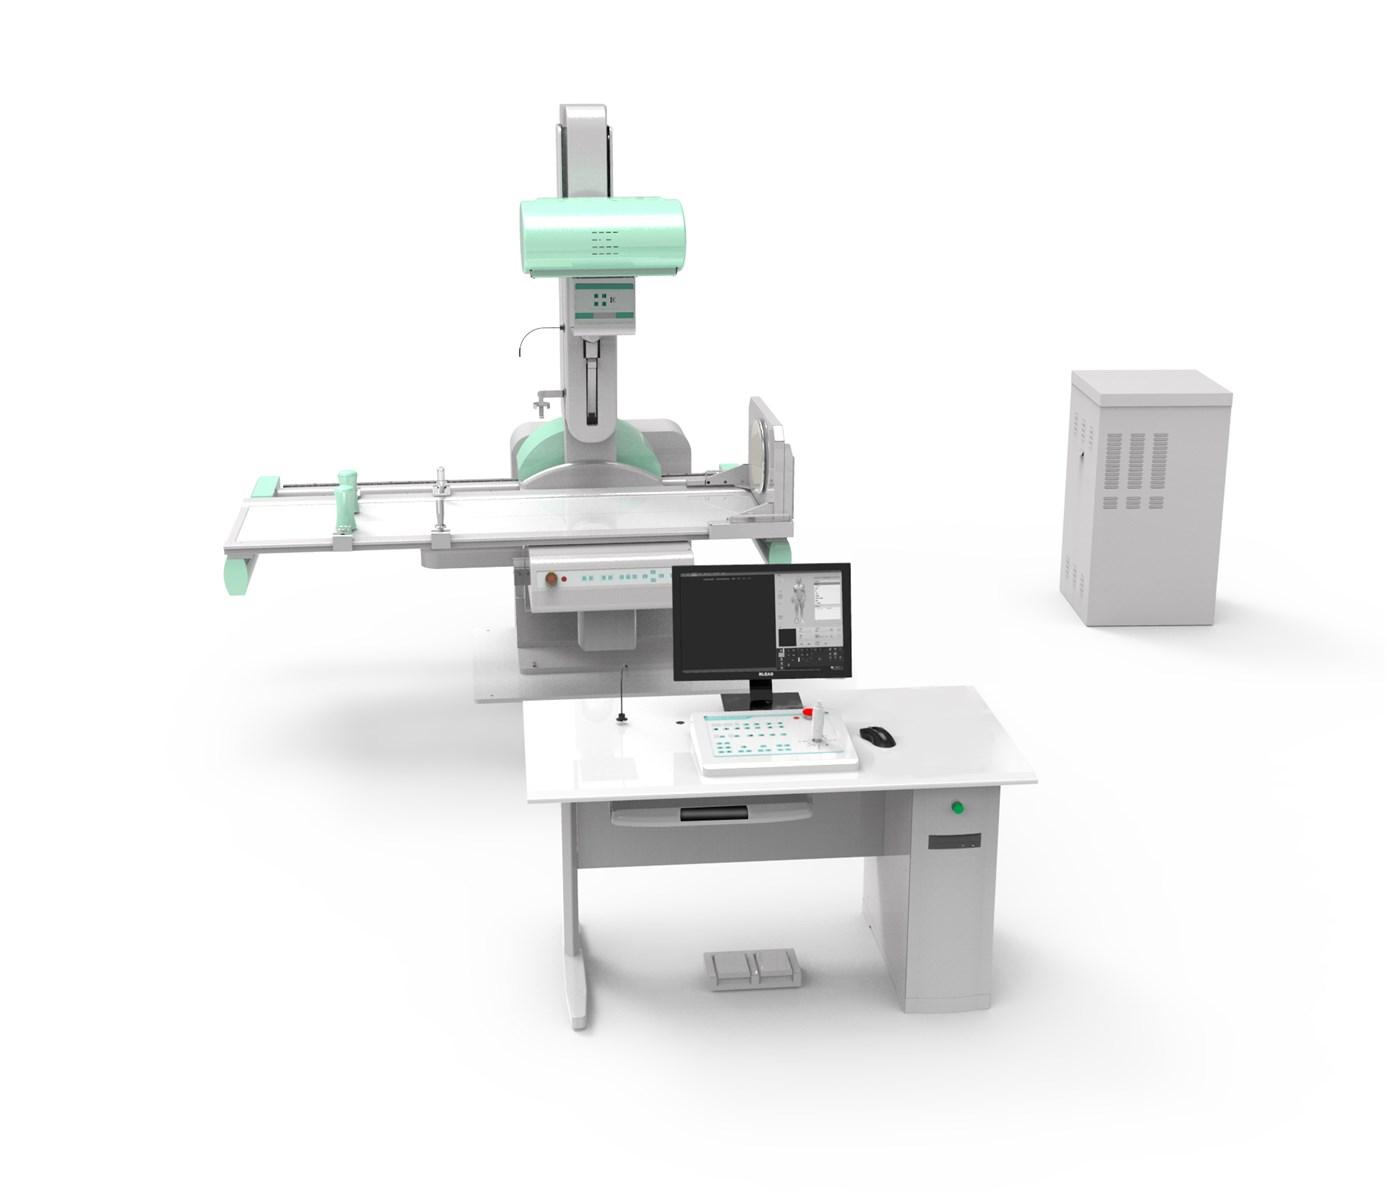 PLD8600D Deluxe Model HF Digital Radiography Fluoroscopy System